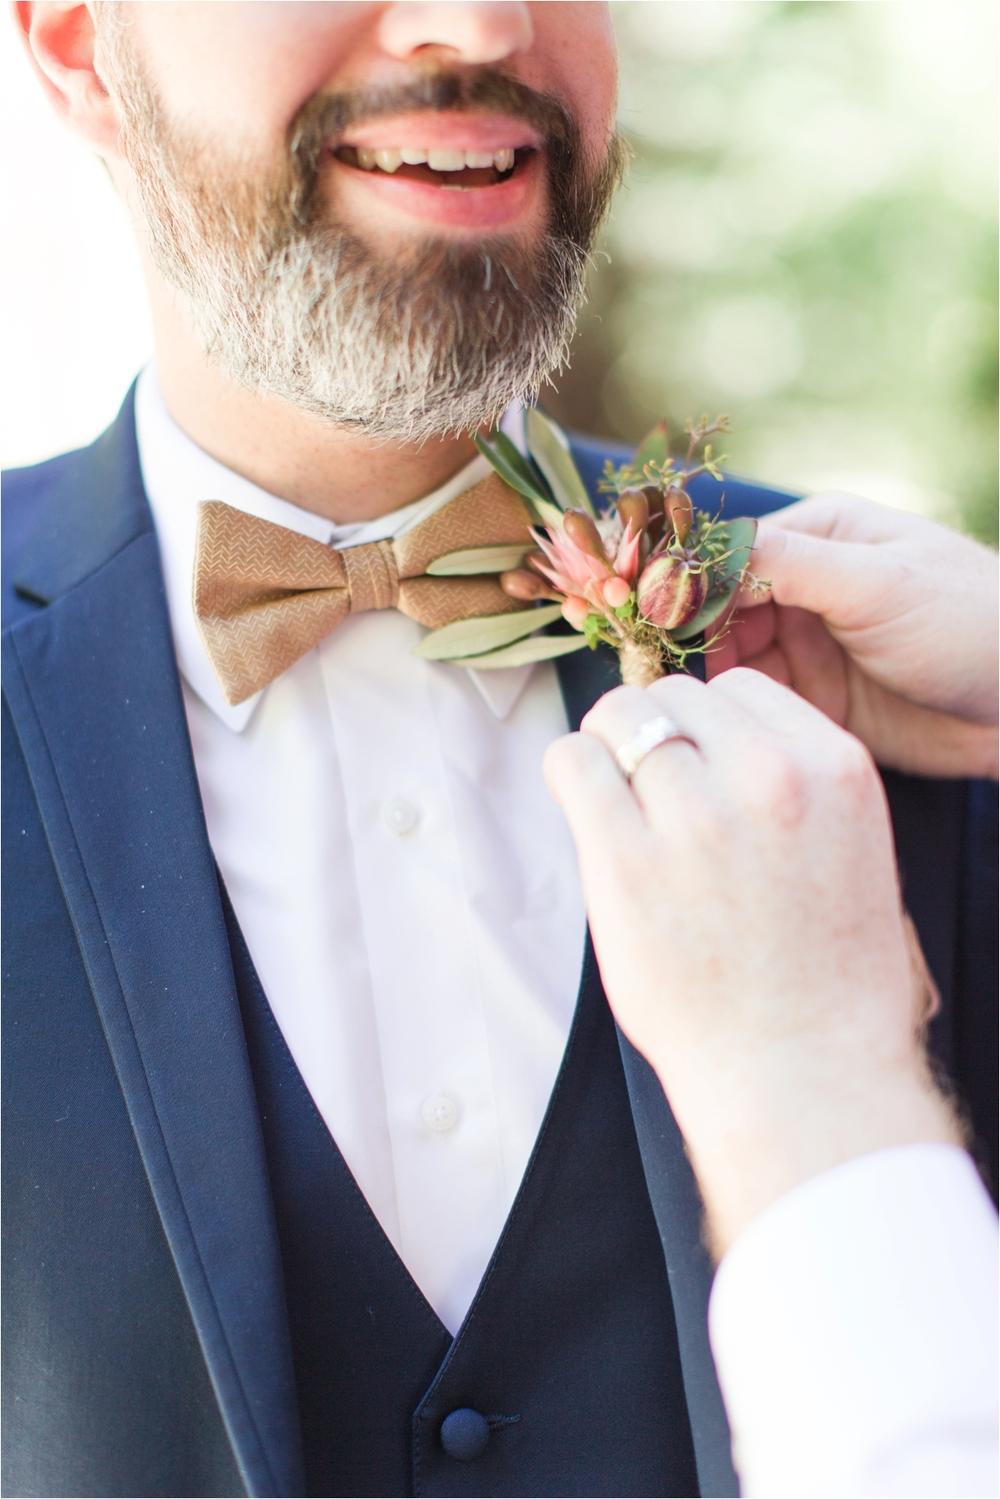 Nestldown wedding Photos by Briana Calderon Photography_0193.jpg